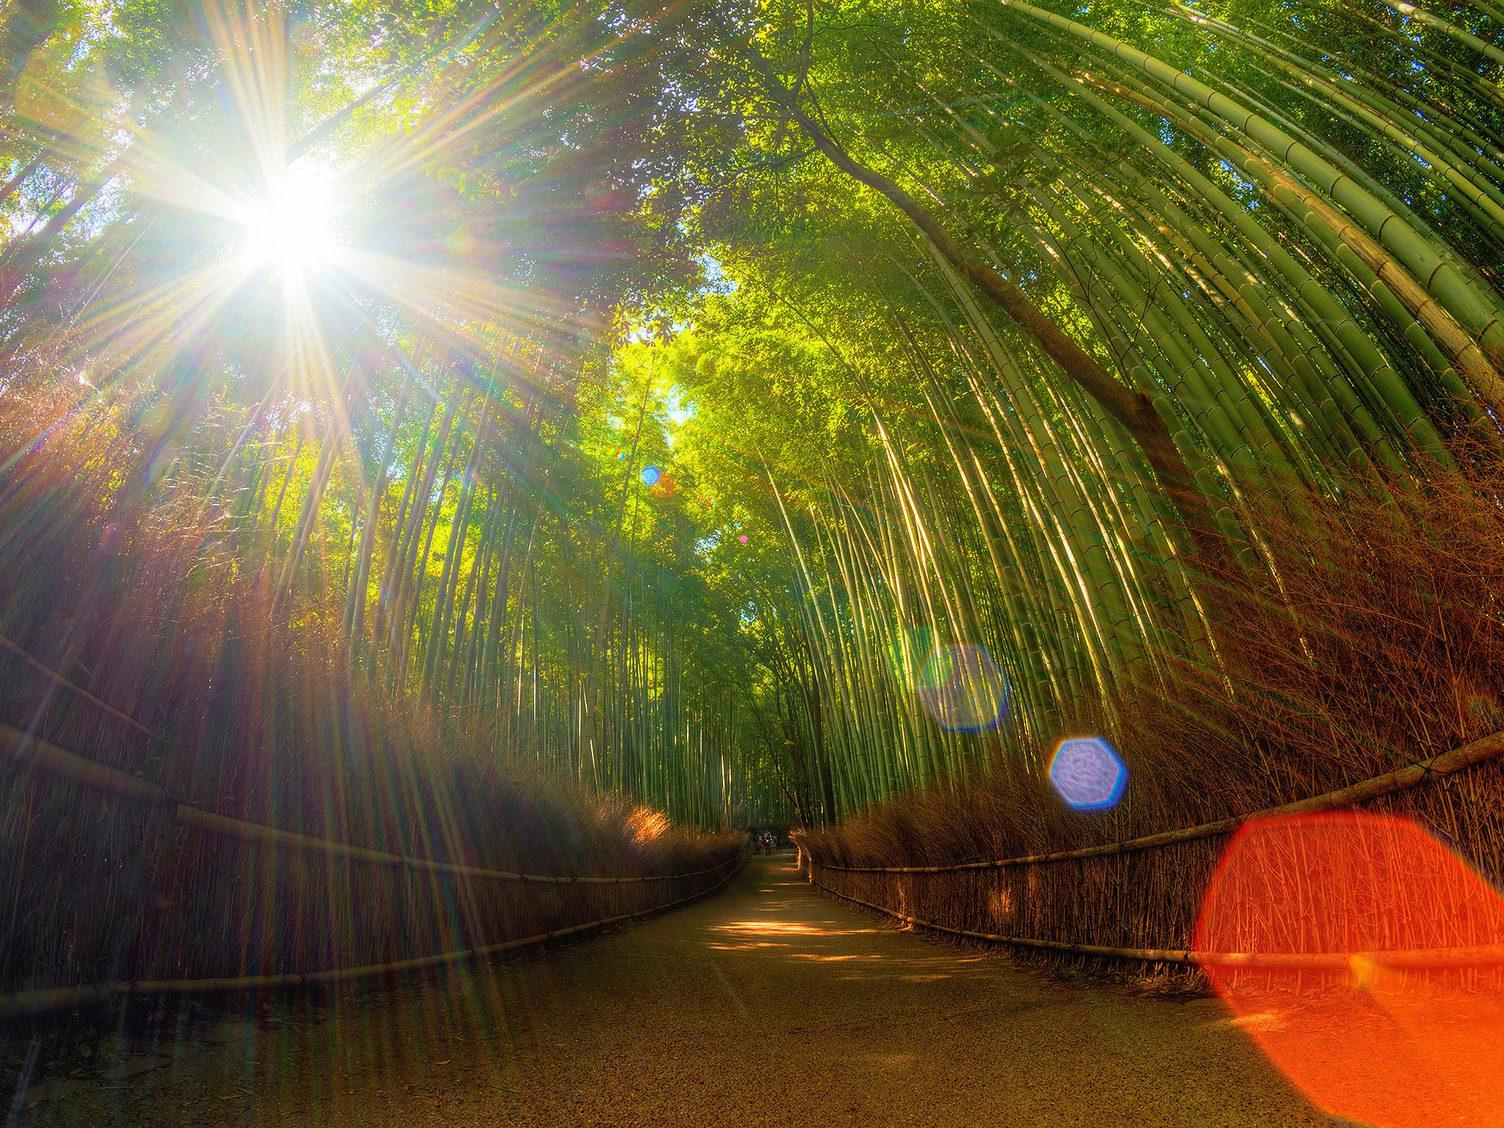 Natural Wonder: Bamboo Grove, Japan